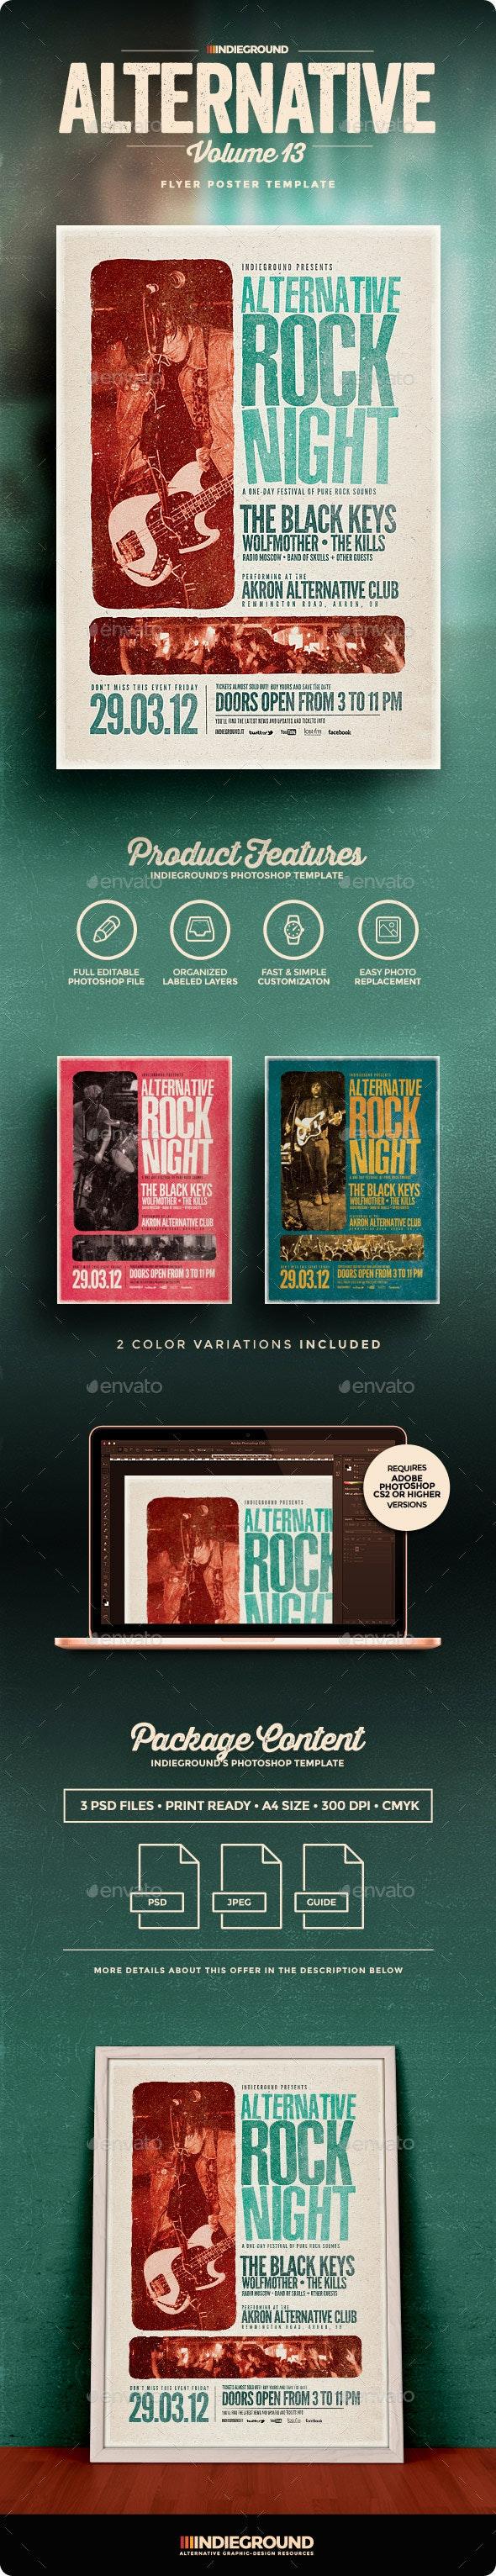 Alternative Flyer/Poster Vol. 13 - Concerts Events